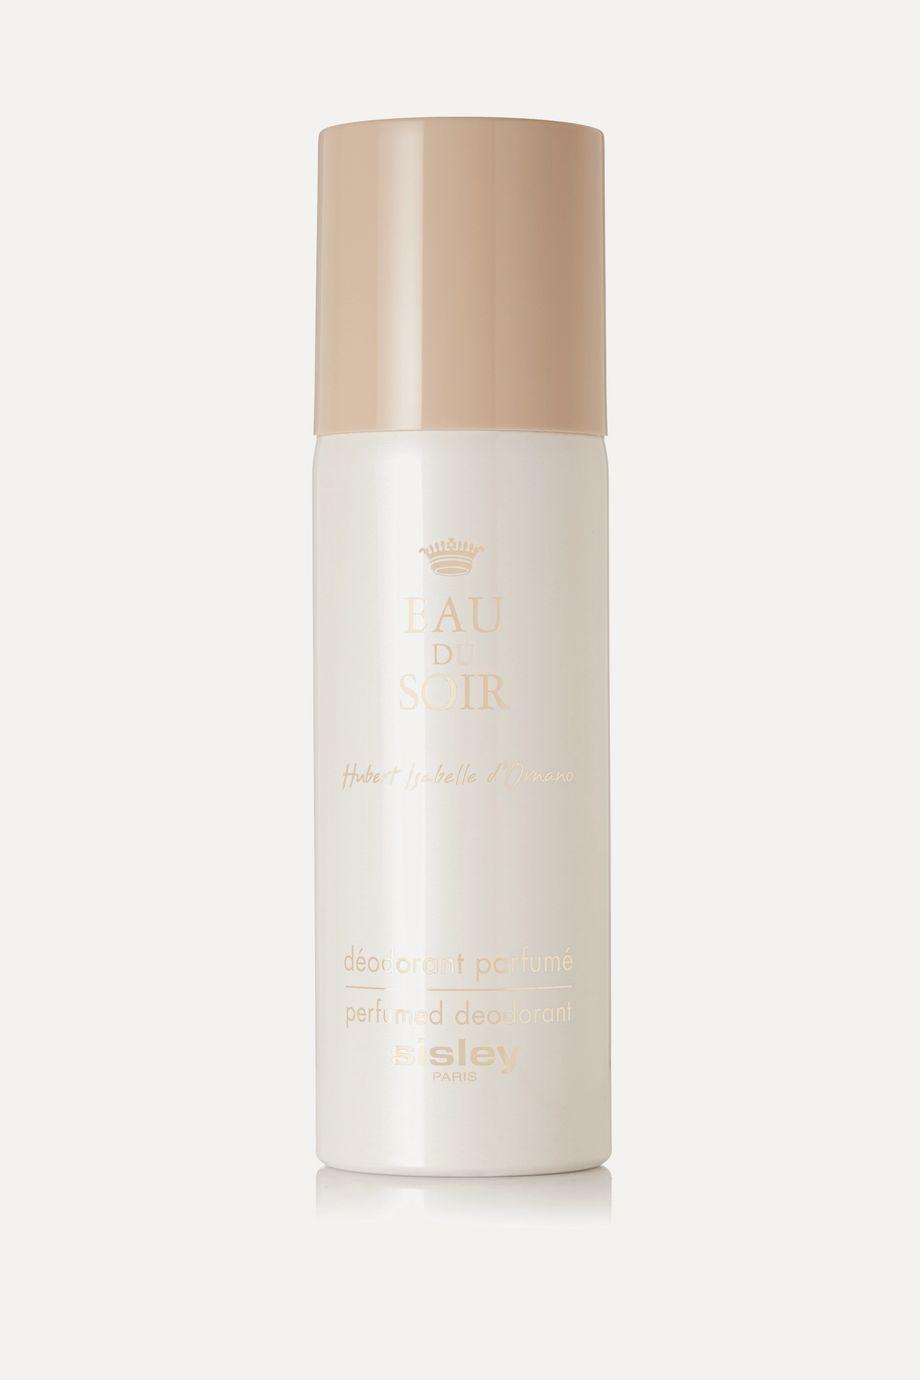 Sisley Eau du Soir Perfumed Deodorant, 150ml